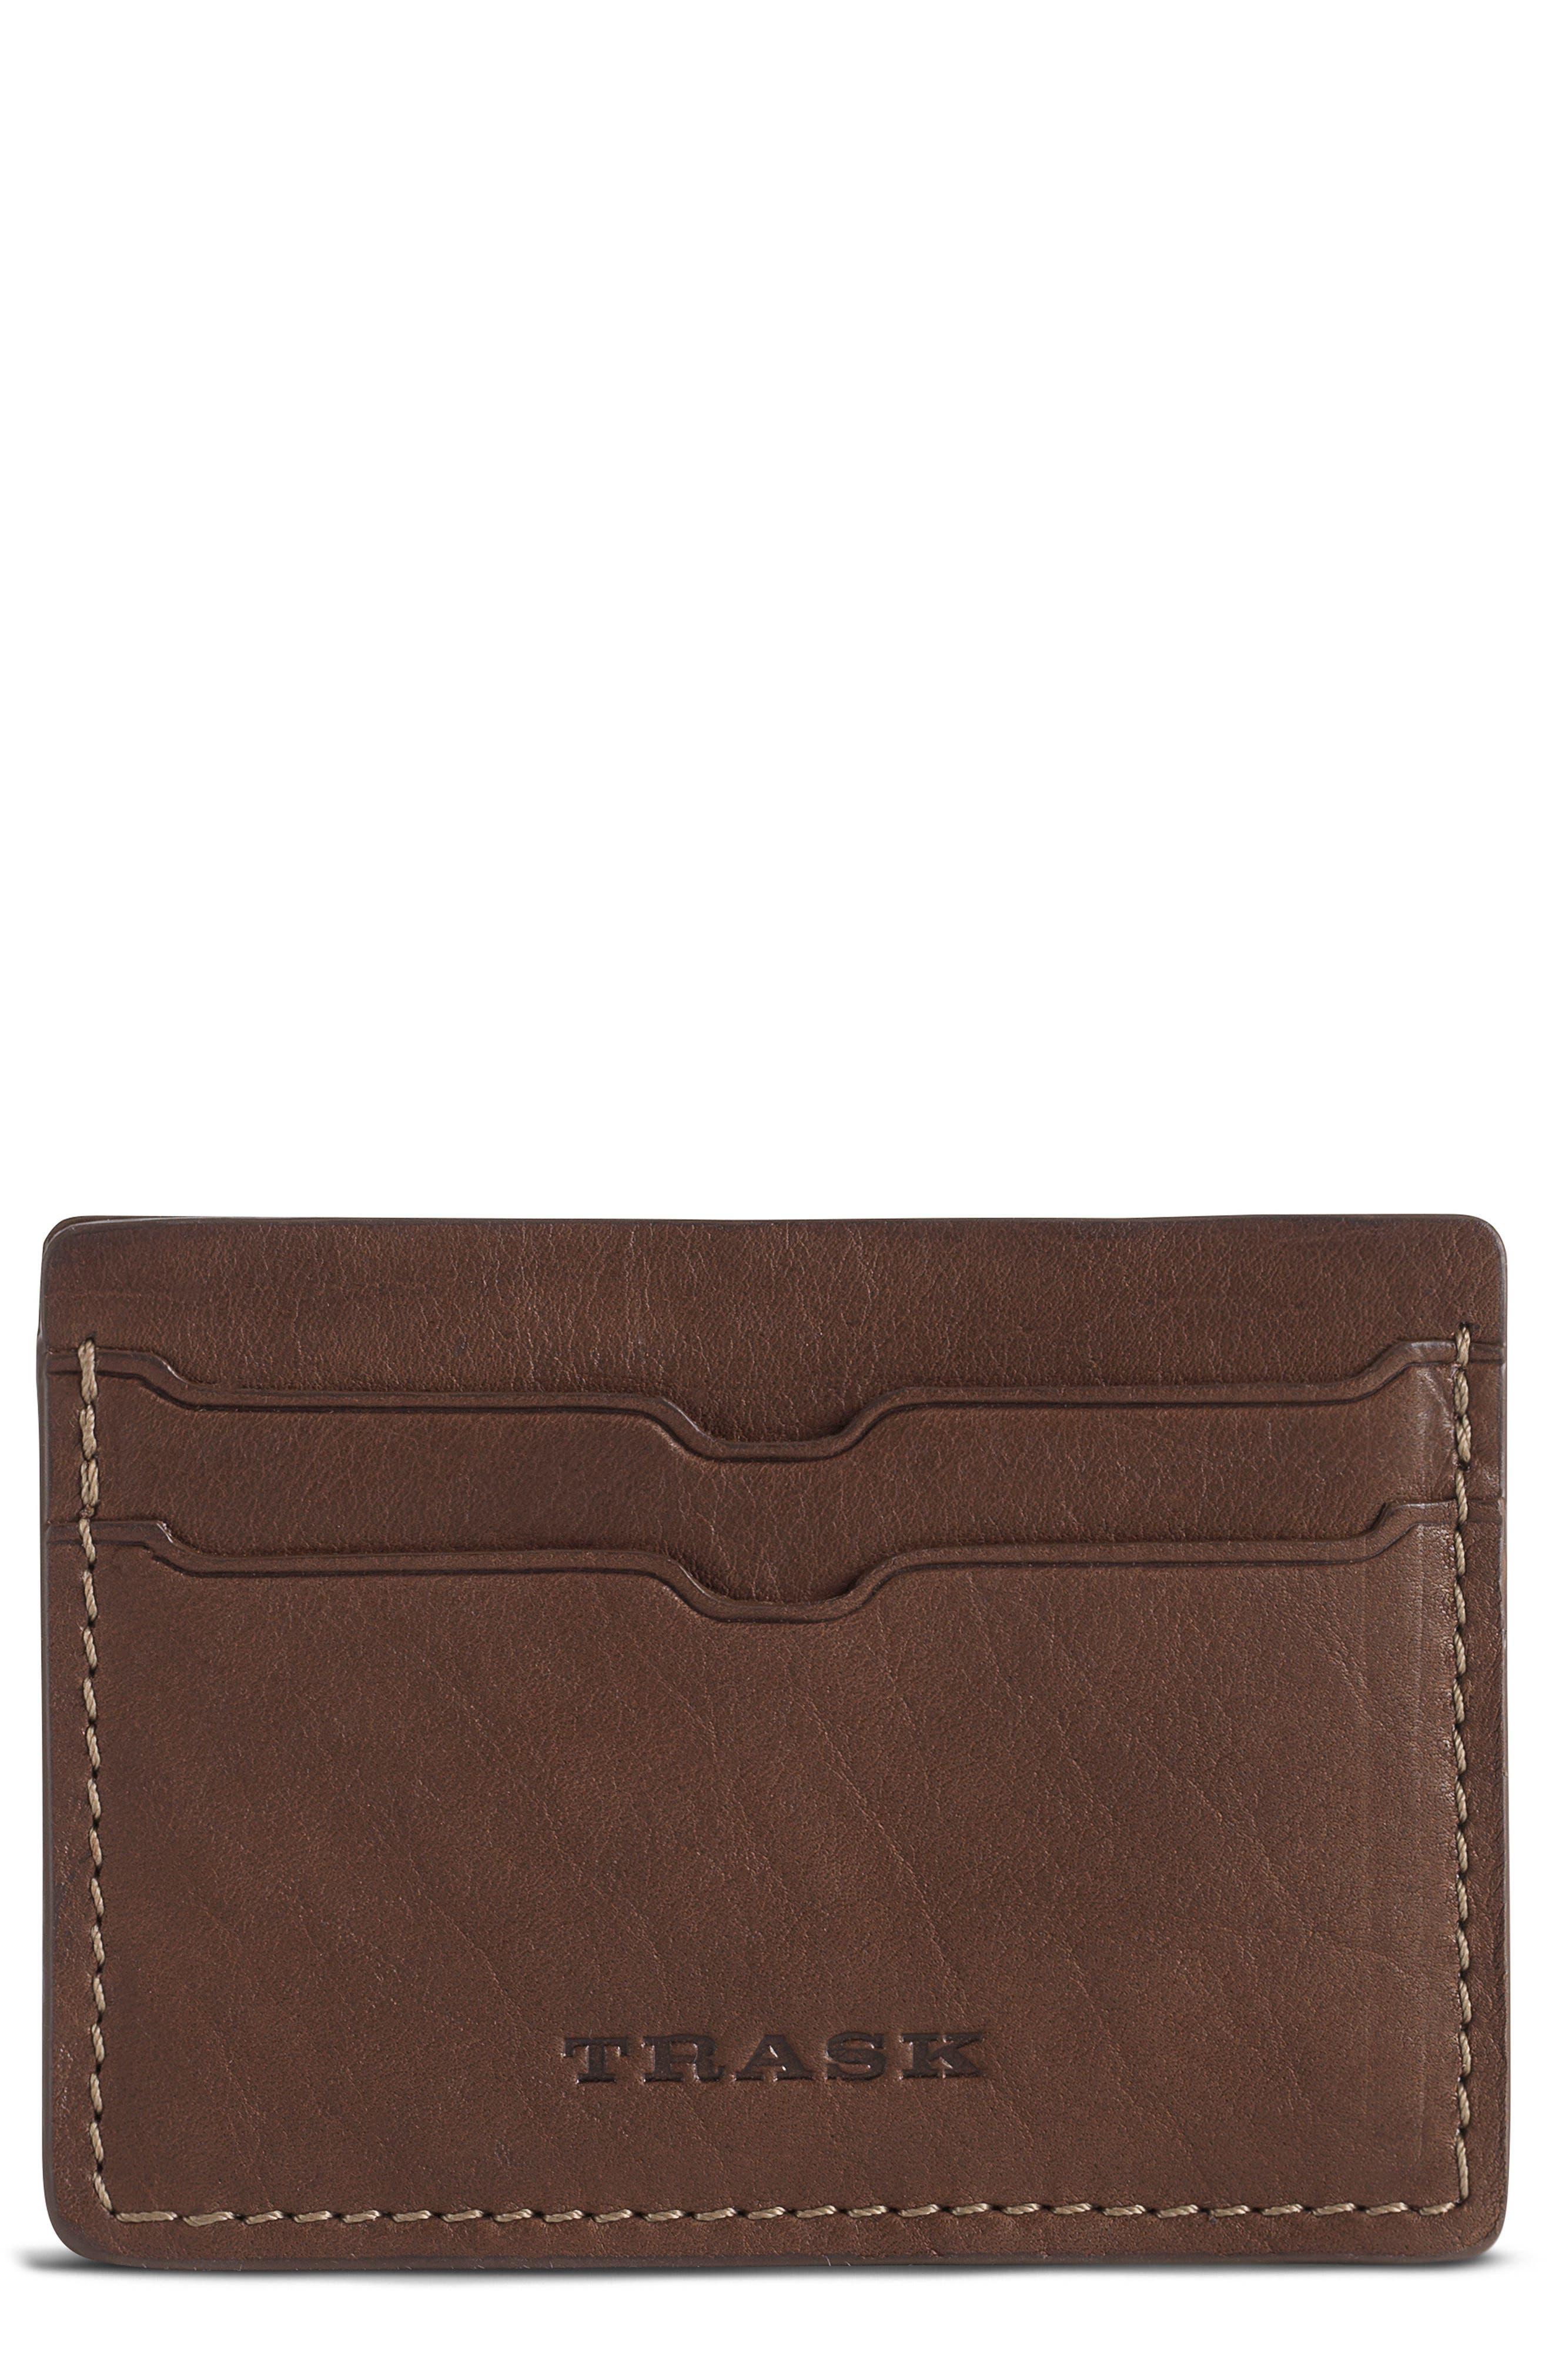 Jackson Card Case,                         Main,                         color, 200